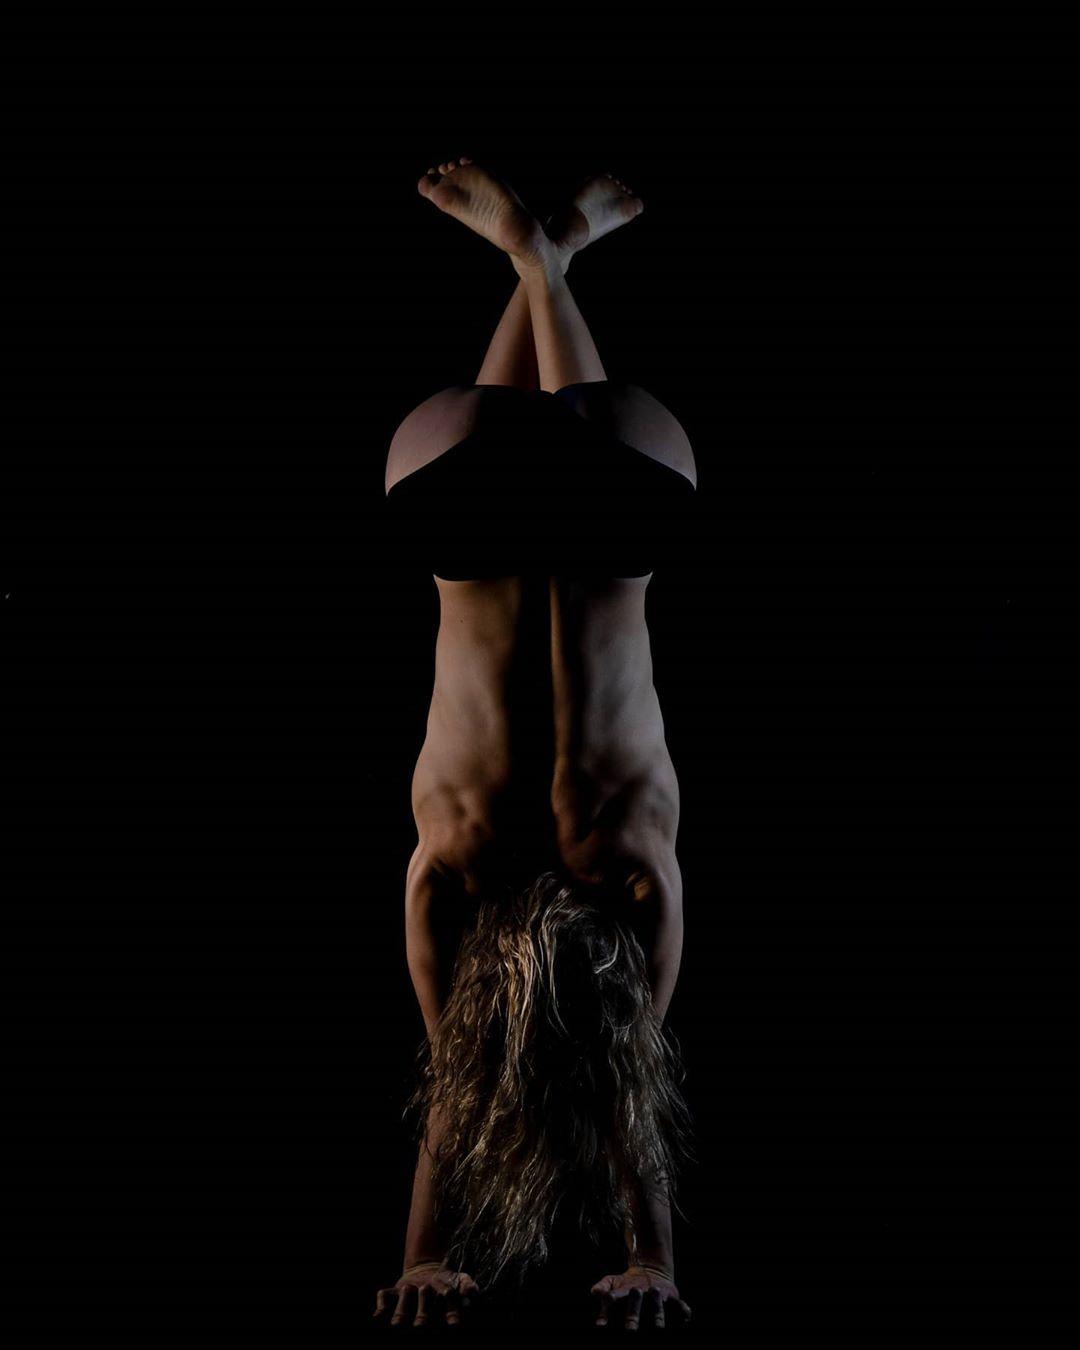 Akrobatisches Sportmodel Anna Herkt – Bild 3